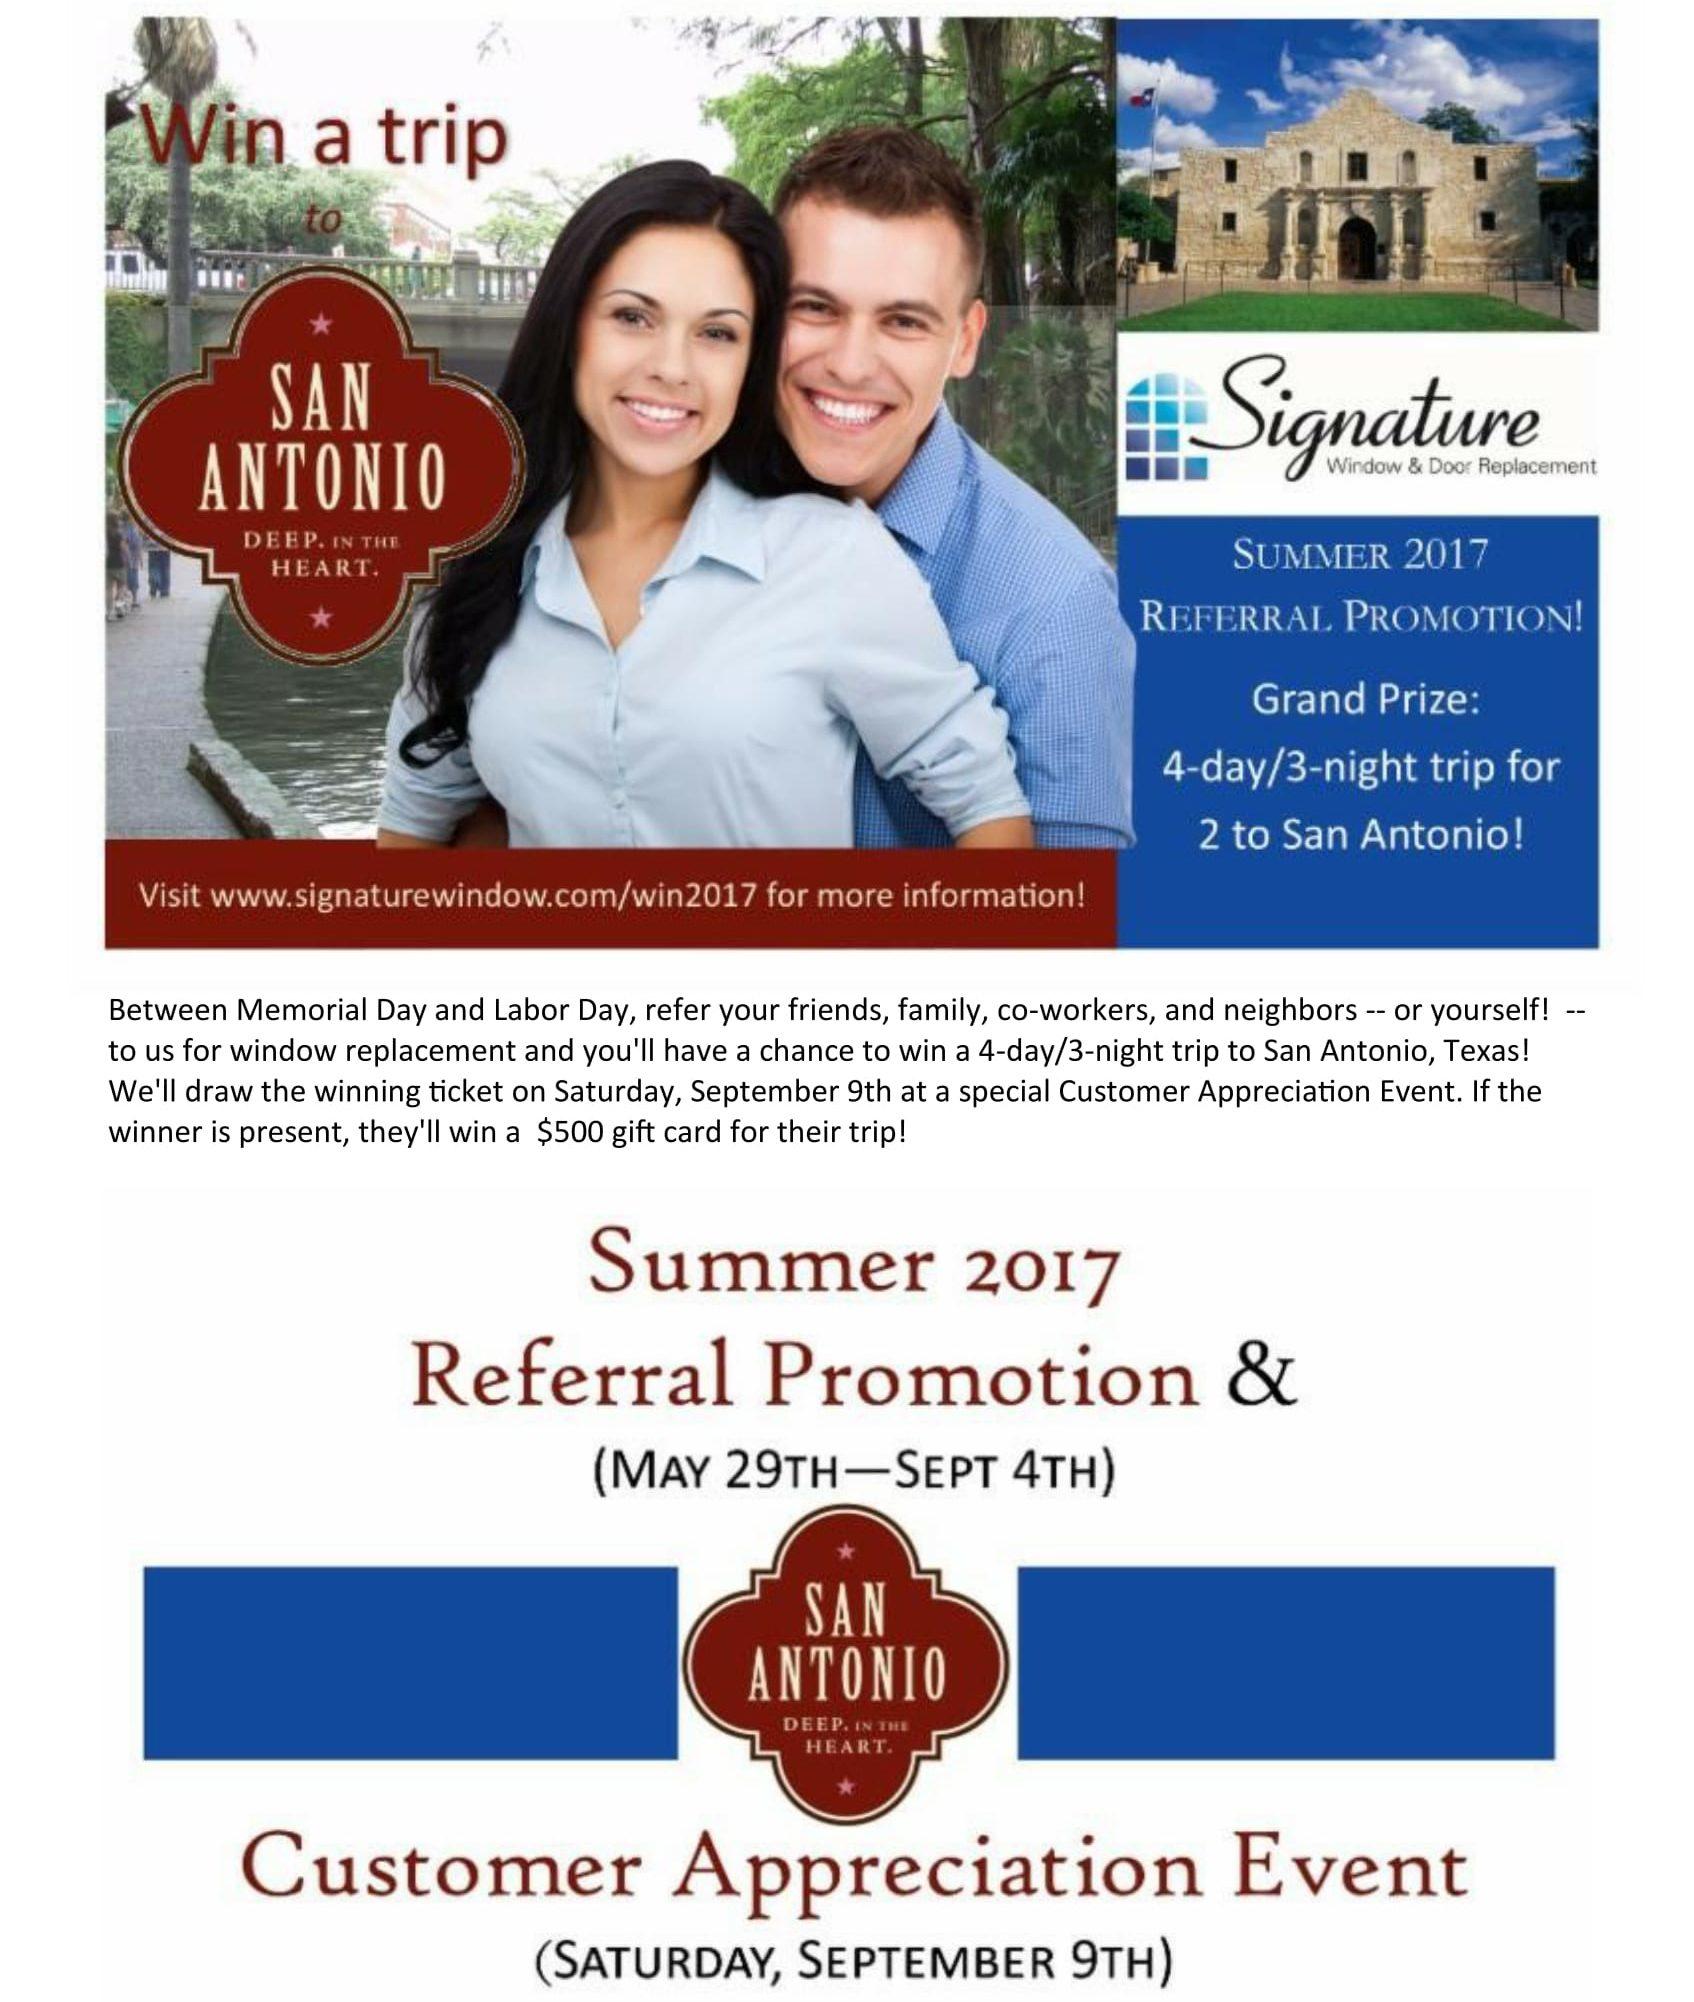 Signature Summer Promo Win2017 copy and images 1 e1493273612904